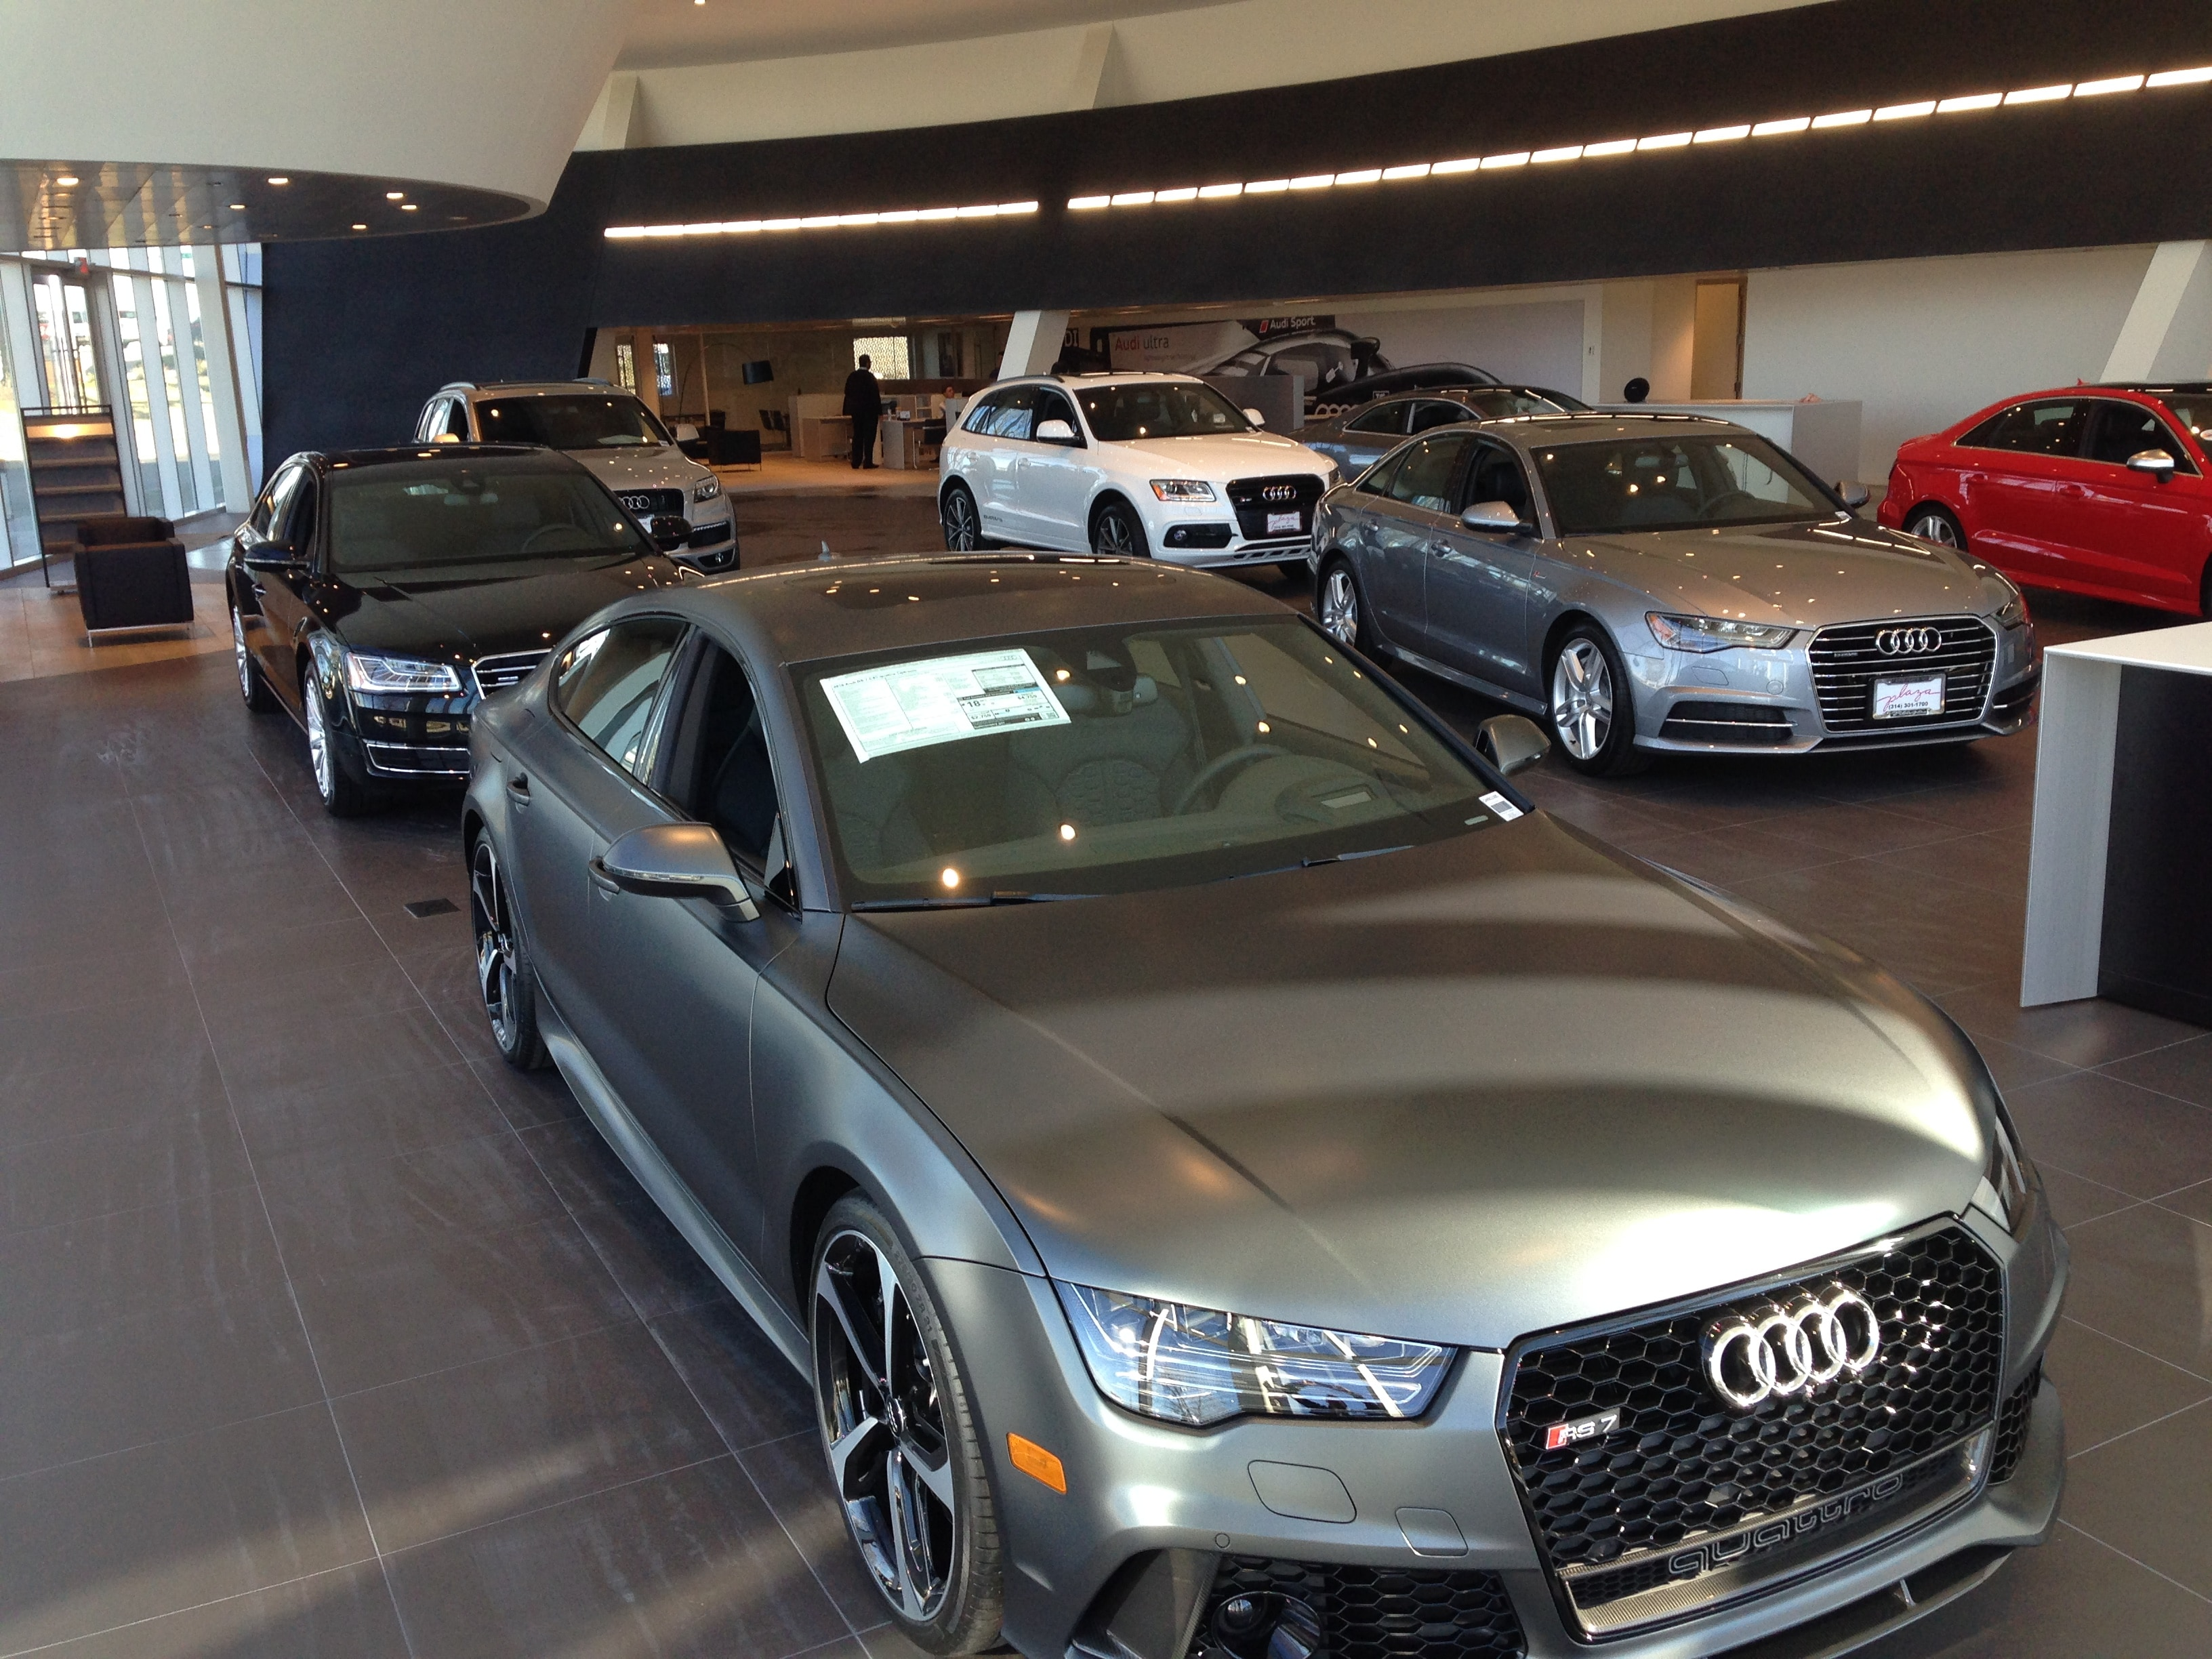 Audi Dealership St Louis Audi Creve Coeur - Plaza audi